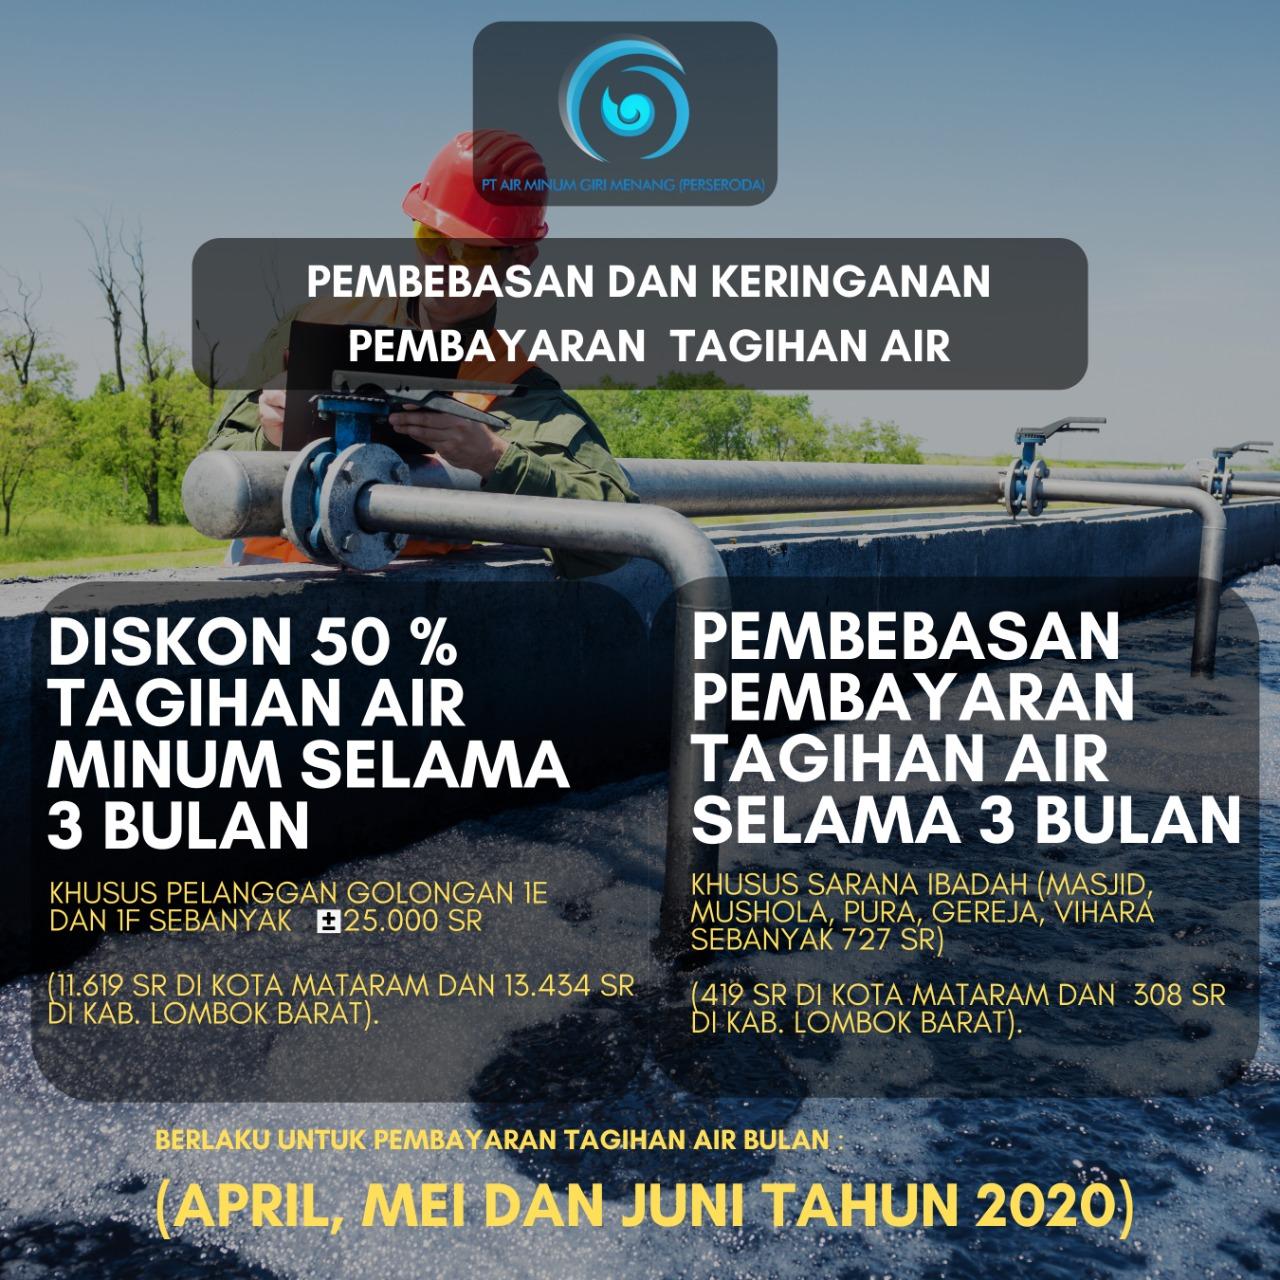 PT Air Minum Giri Menang berikan keringanan kepada masyarakat berpenghasilan rendah ditengah wabah korona